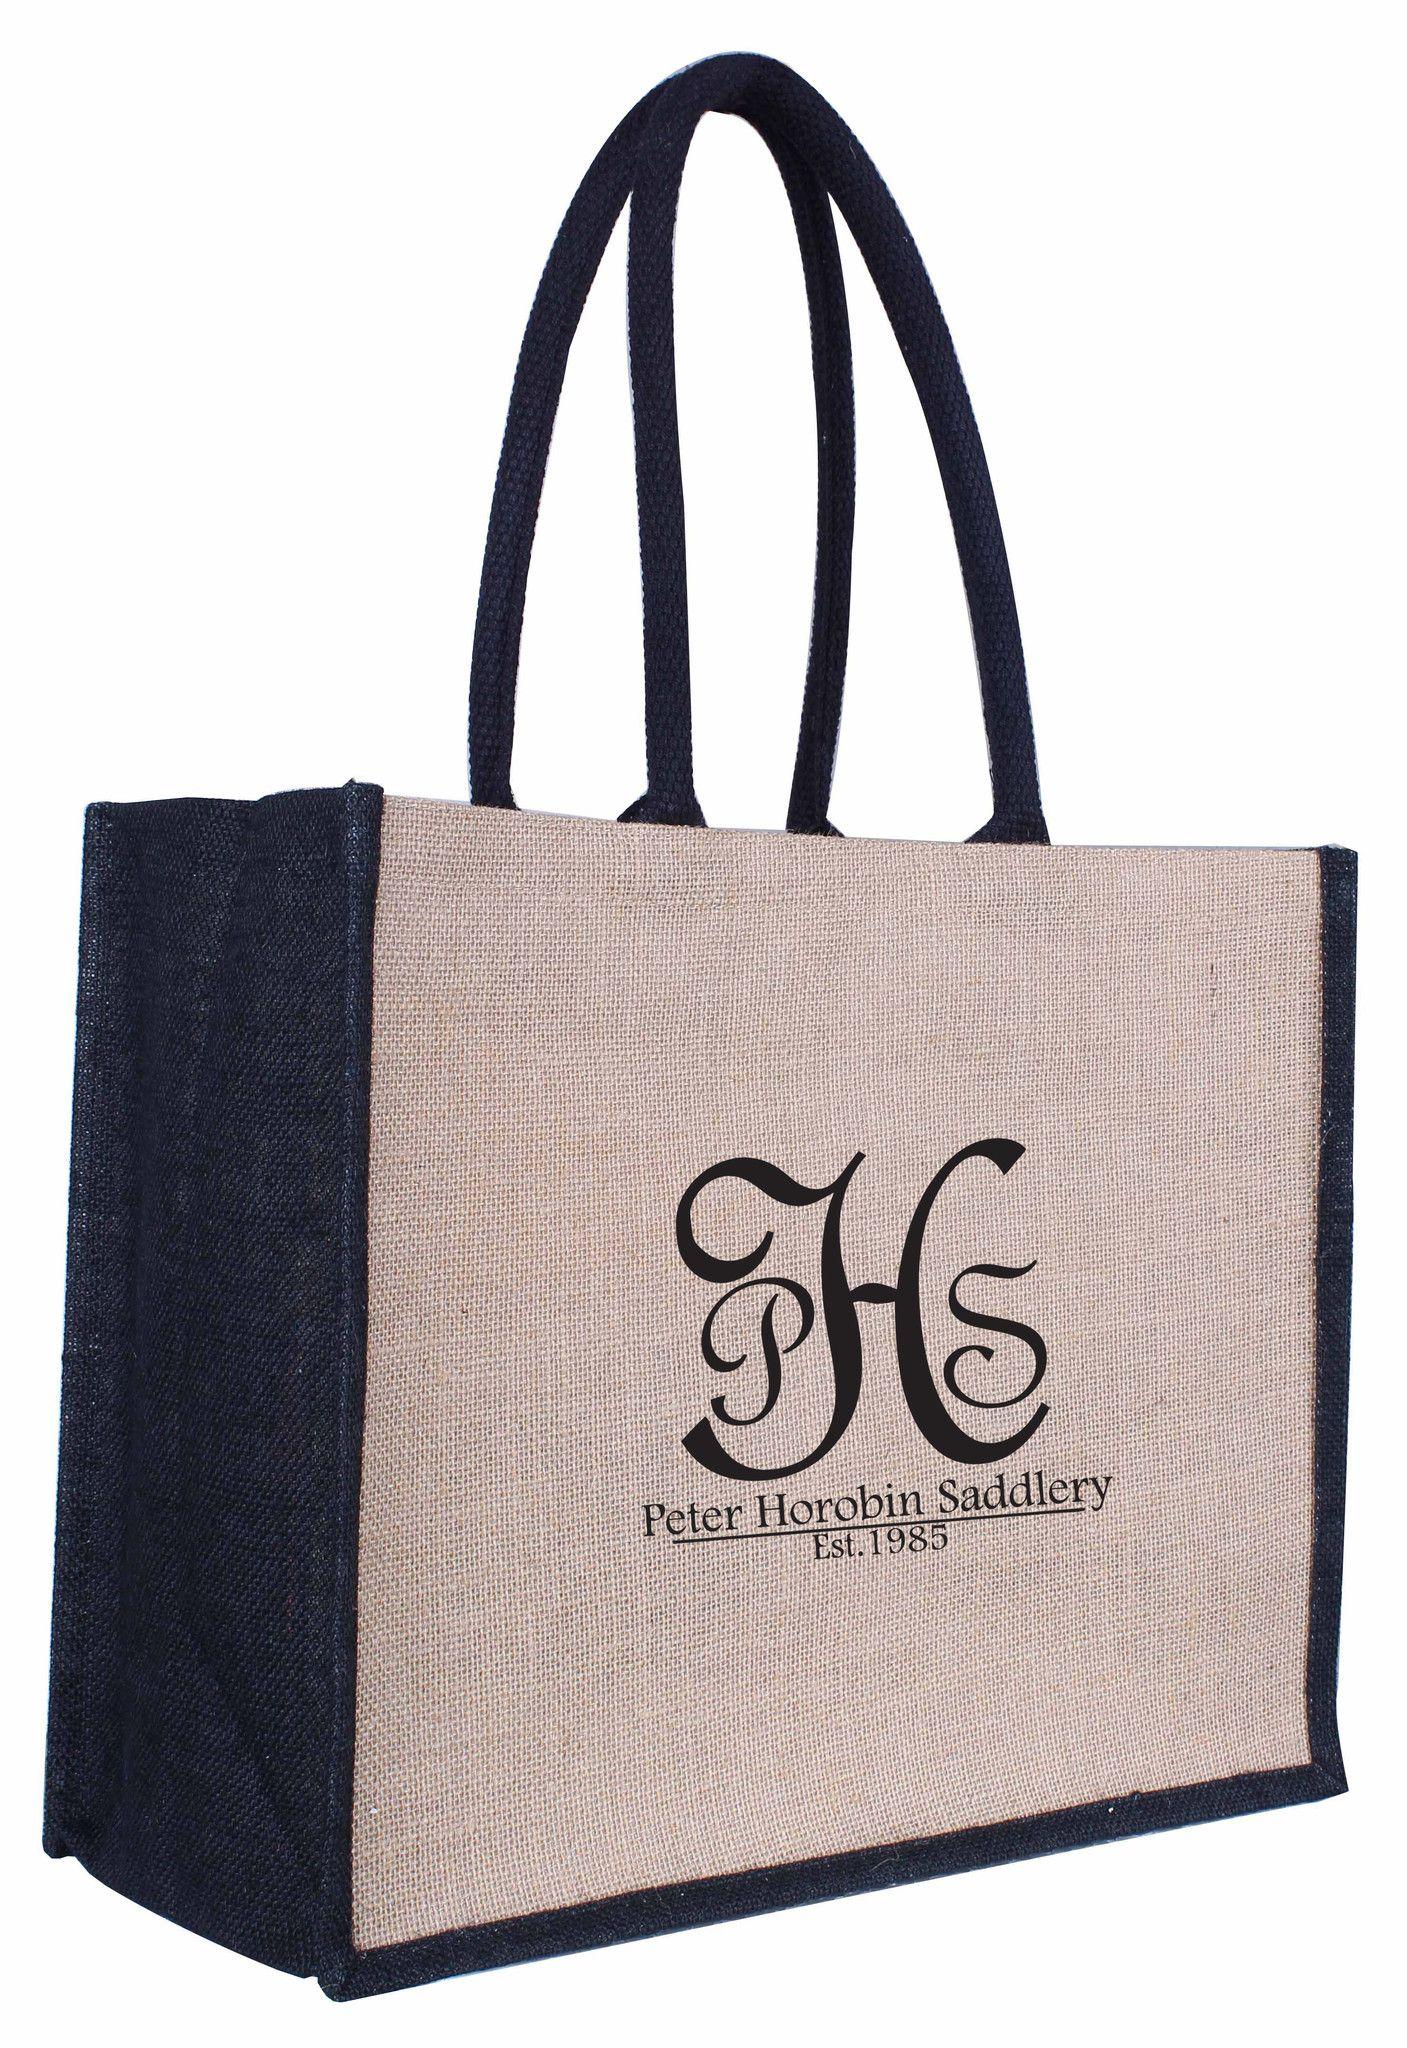 Download Jute Laminated Landscape Black Gusset Jt Land Bk Jute Bags Bags Hessian Bags